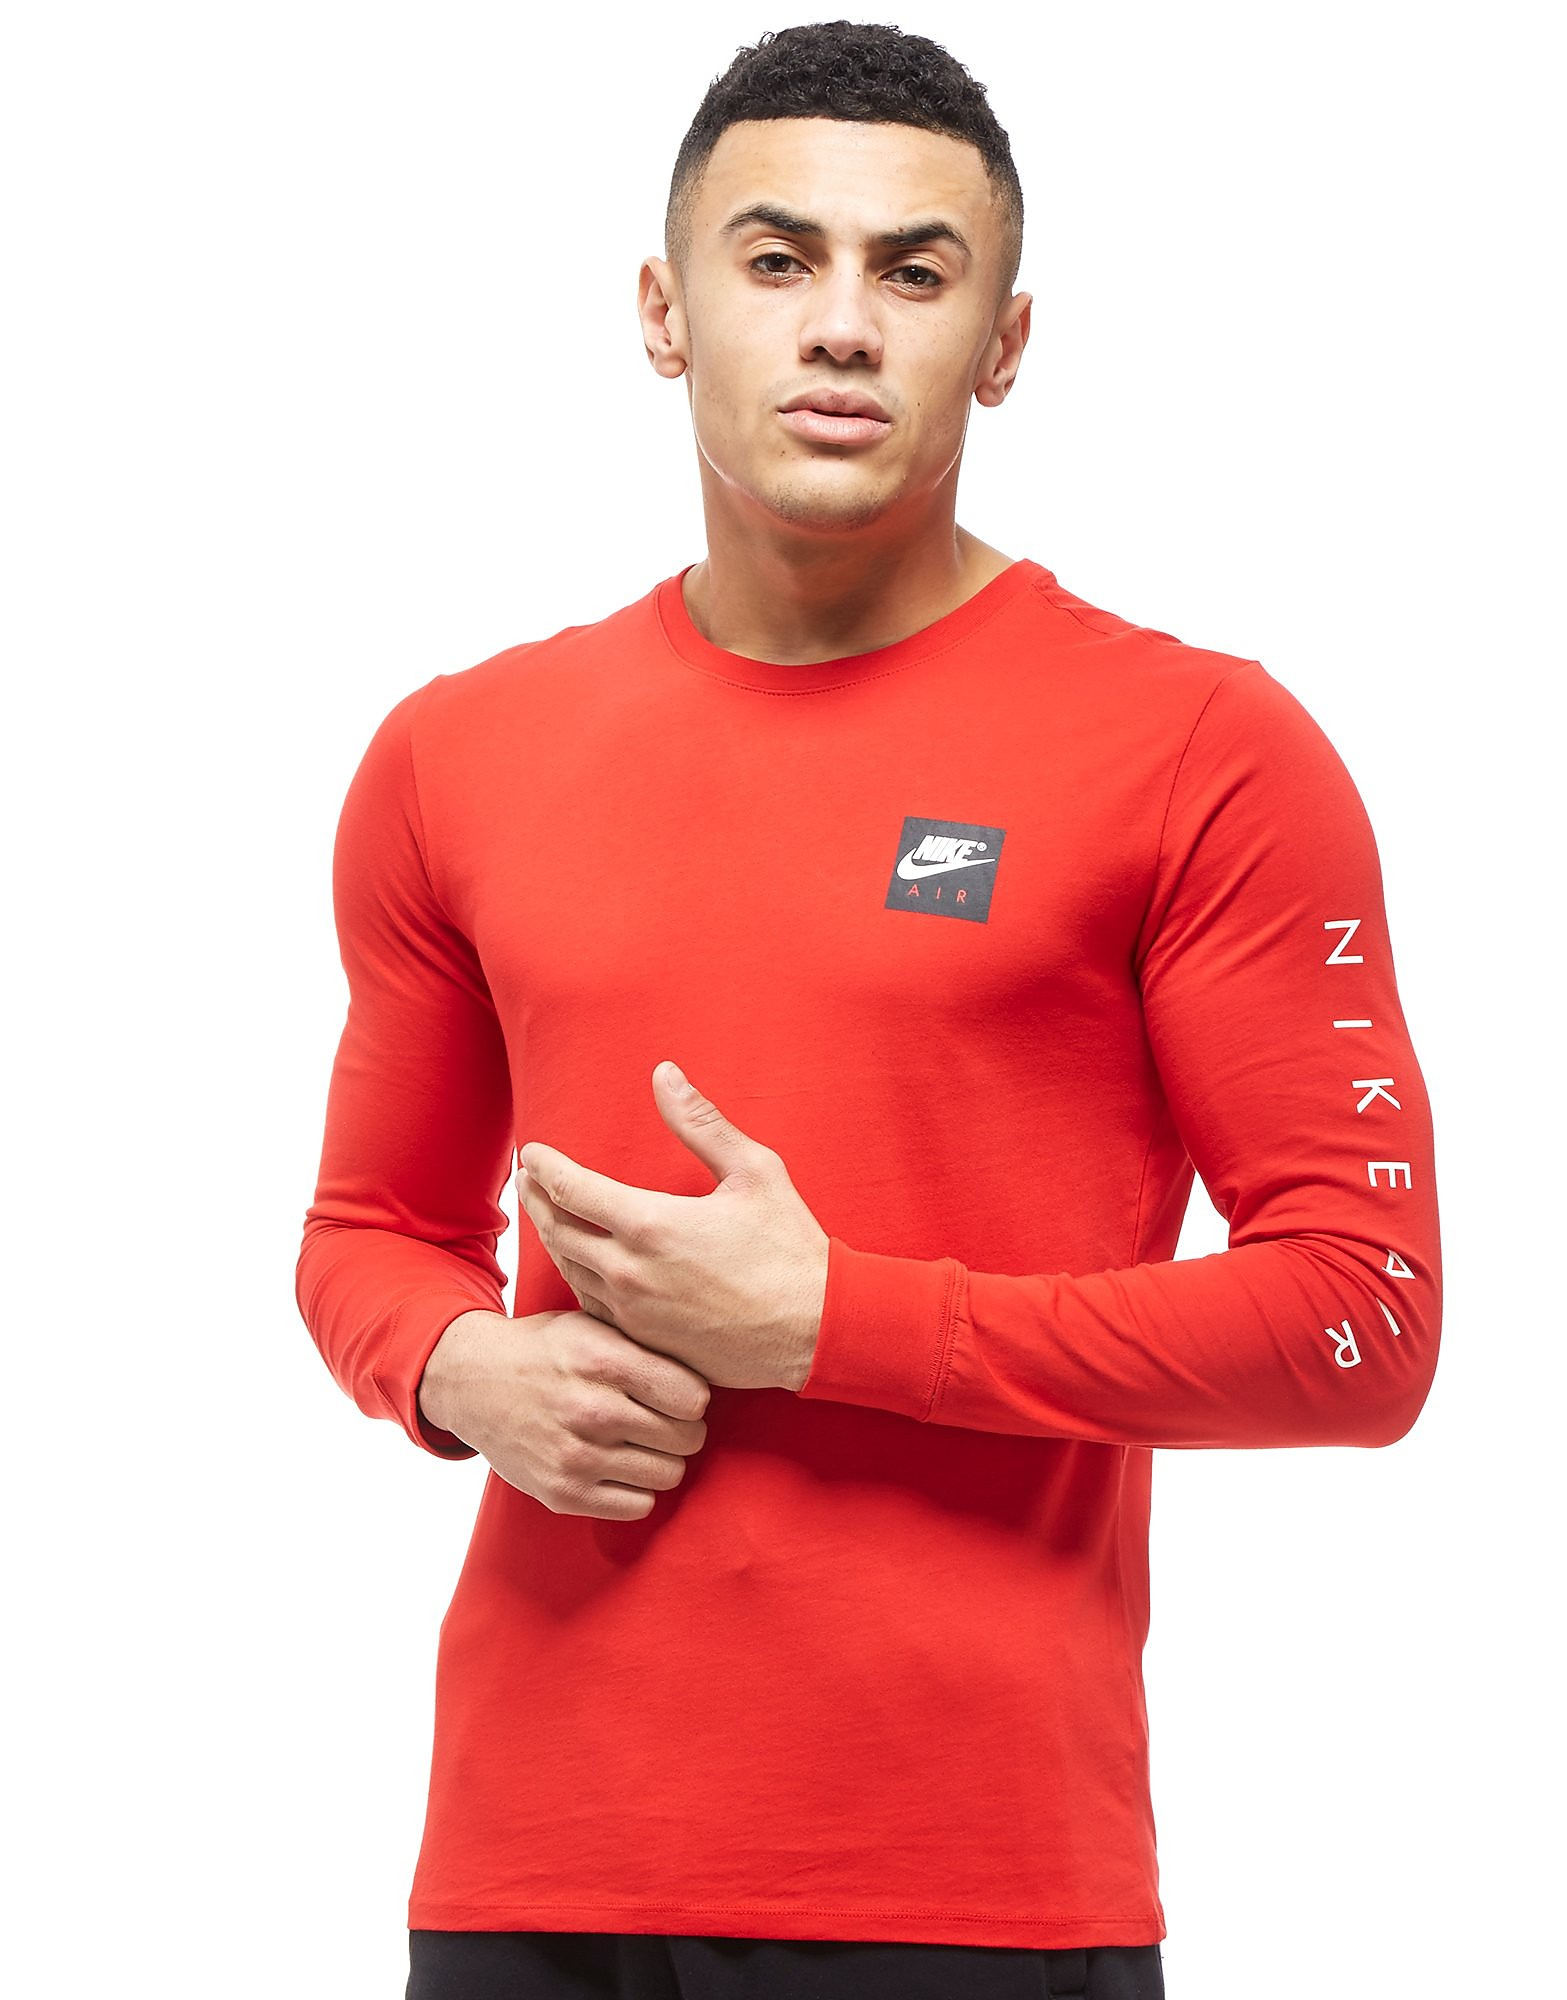 Nike Air Long Sleeve T-Shirt